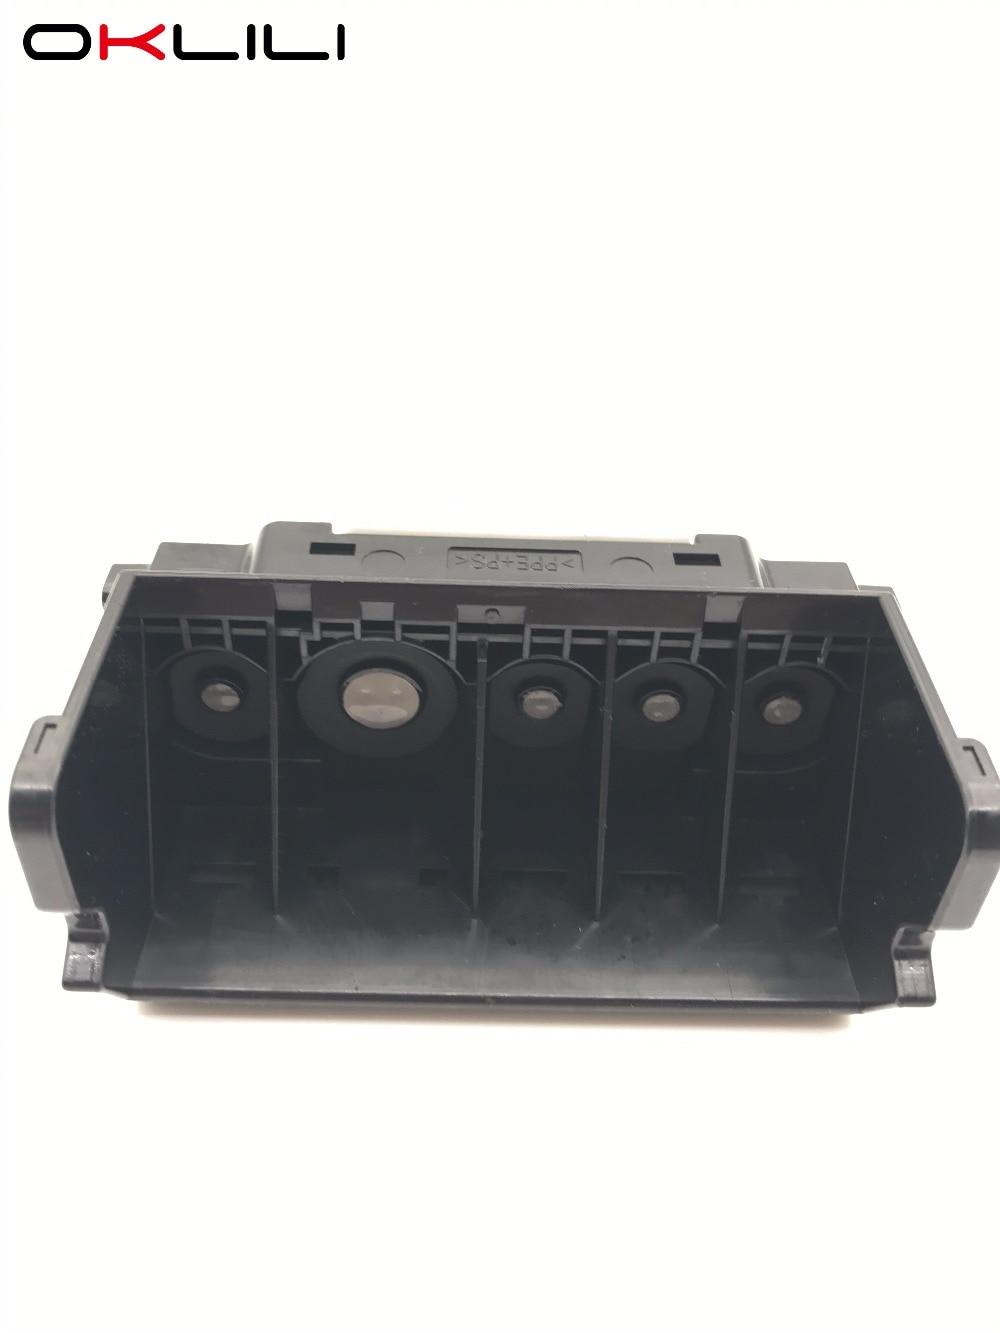 QY6-0080 печатающей головки принтера для Canon ip4820 iP4840 iP4850 iX6520 iX6550 MX715 MX885 MG5220 MG5250 MG5320 MG5350